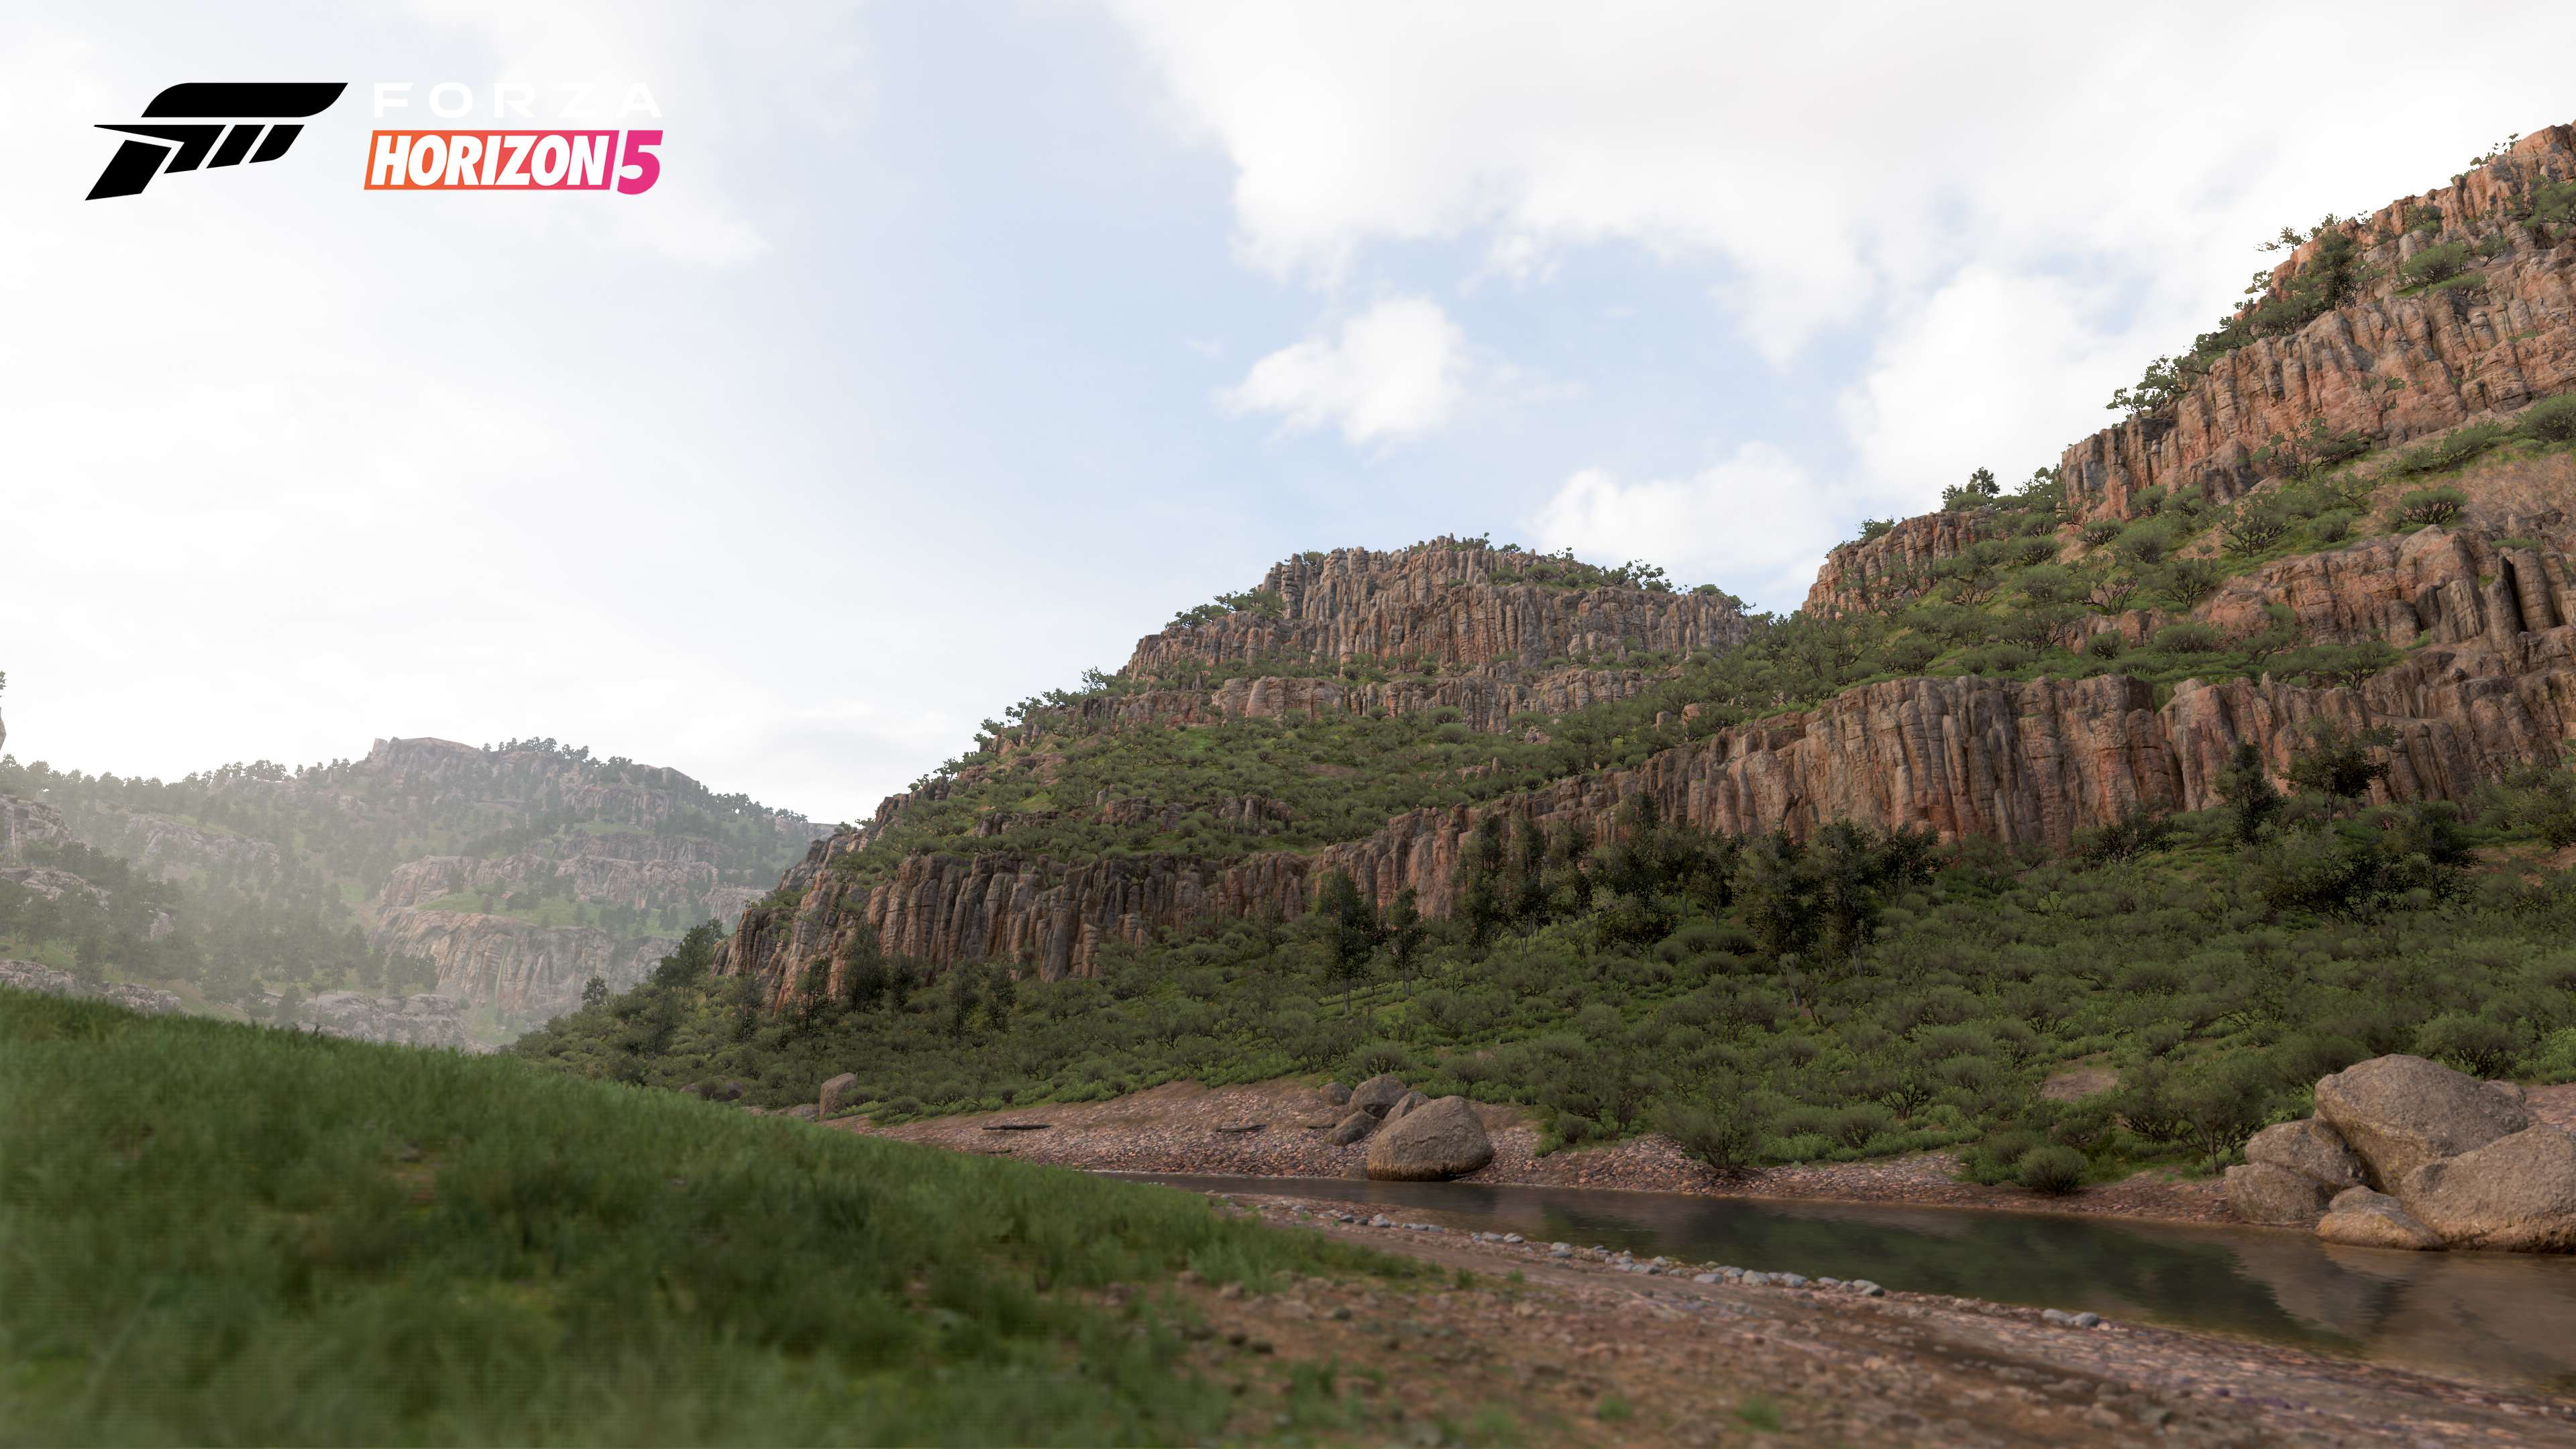 Forza Horizon 5's Biomes & Seasons